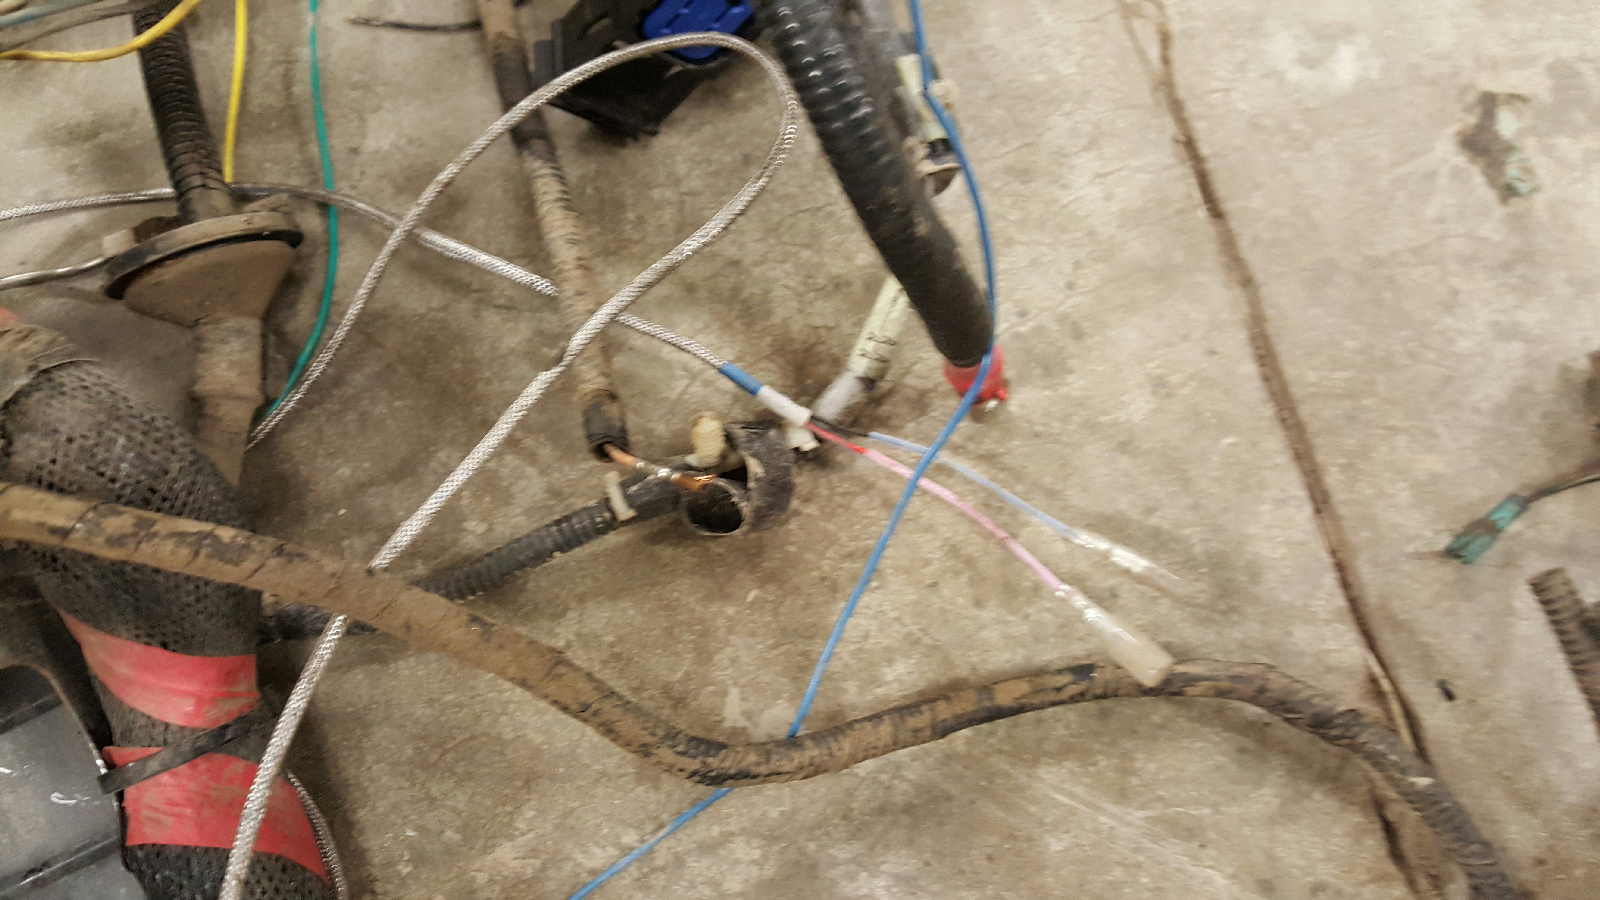 f350 1999 7 3 wiring harness 7 3 wiring diagram